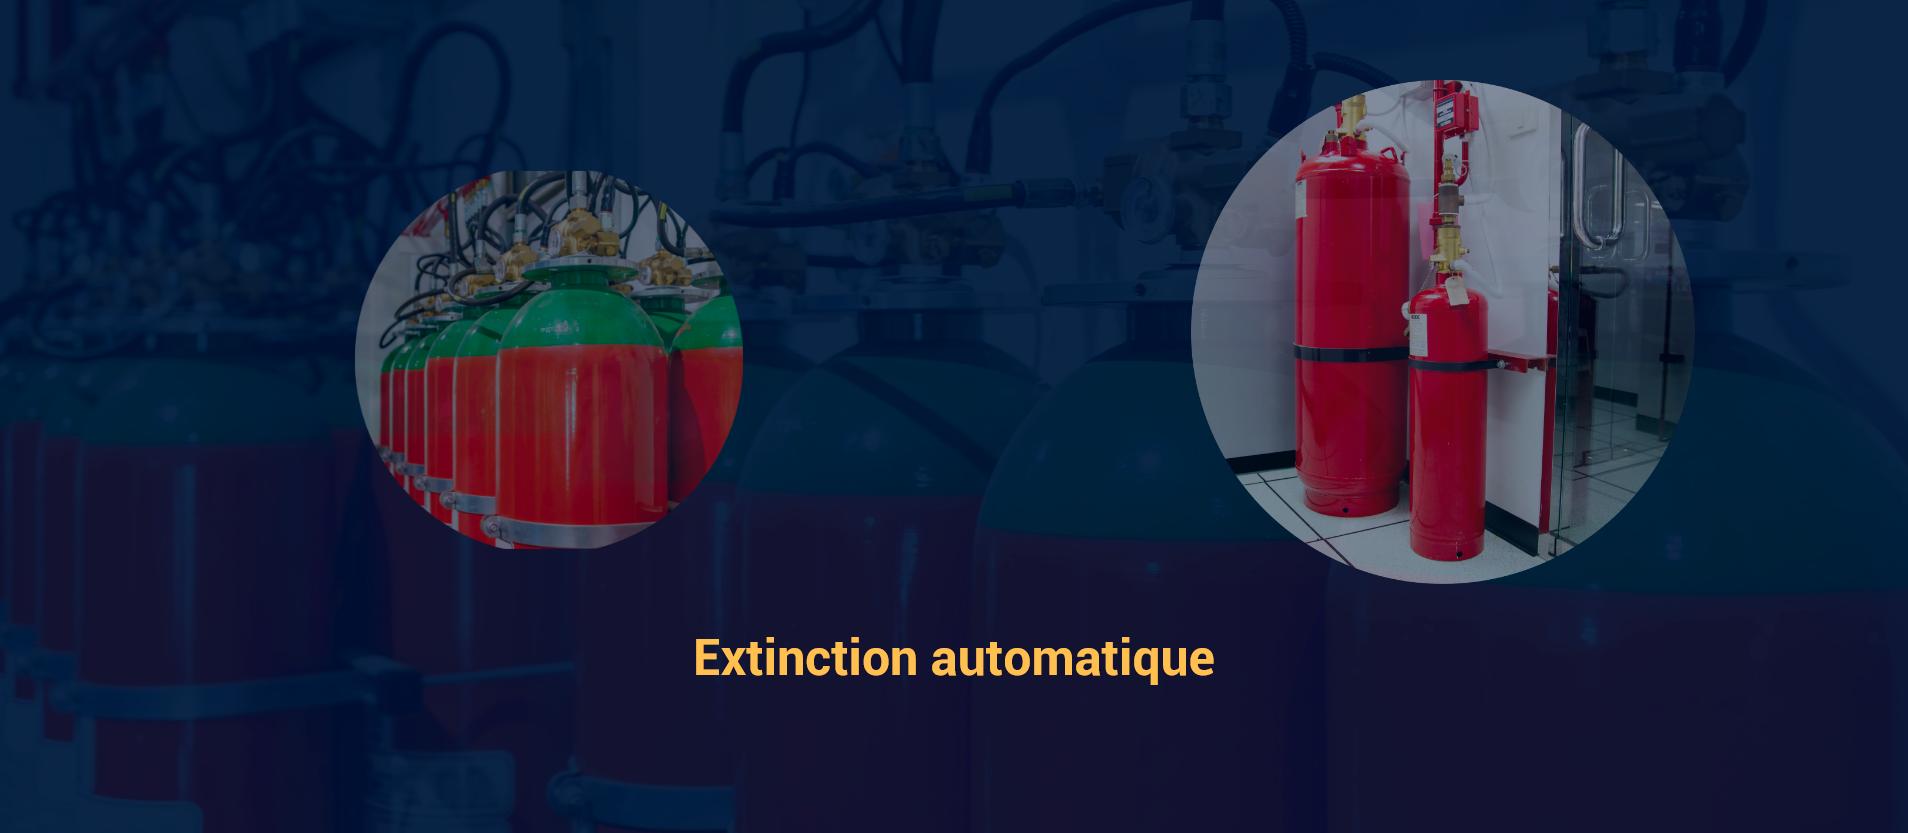 https://www.eris-di.com/wp-content/uploads/2021/07/Extinction_2.png